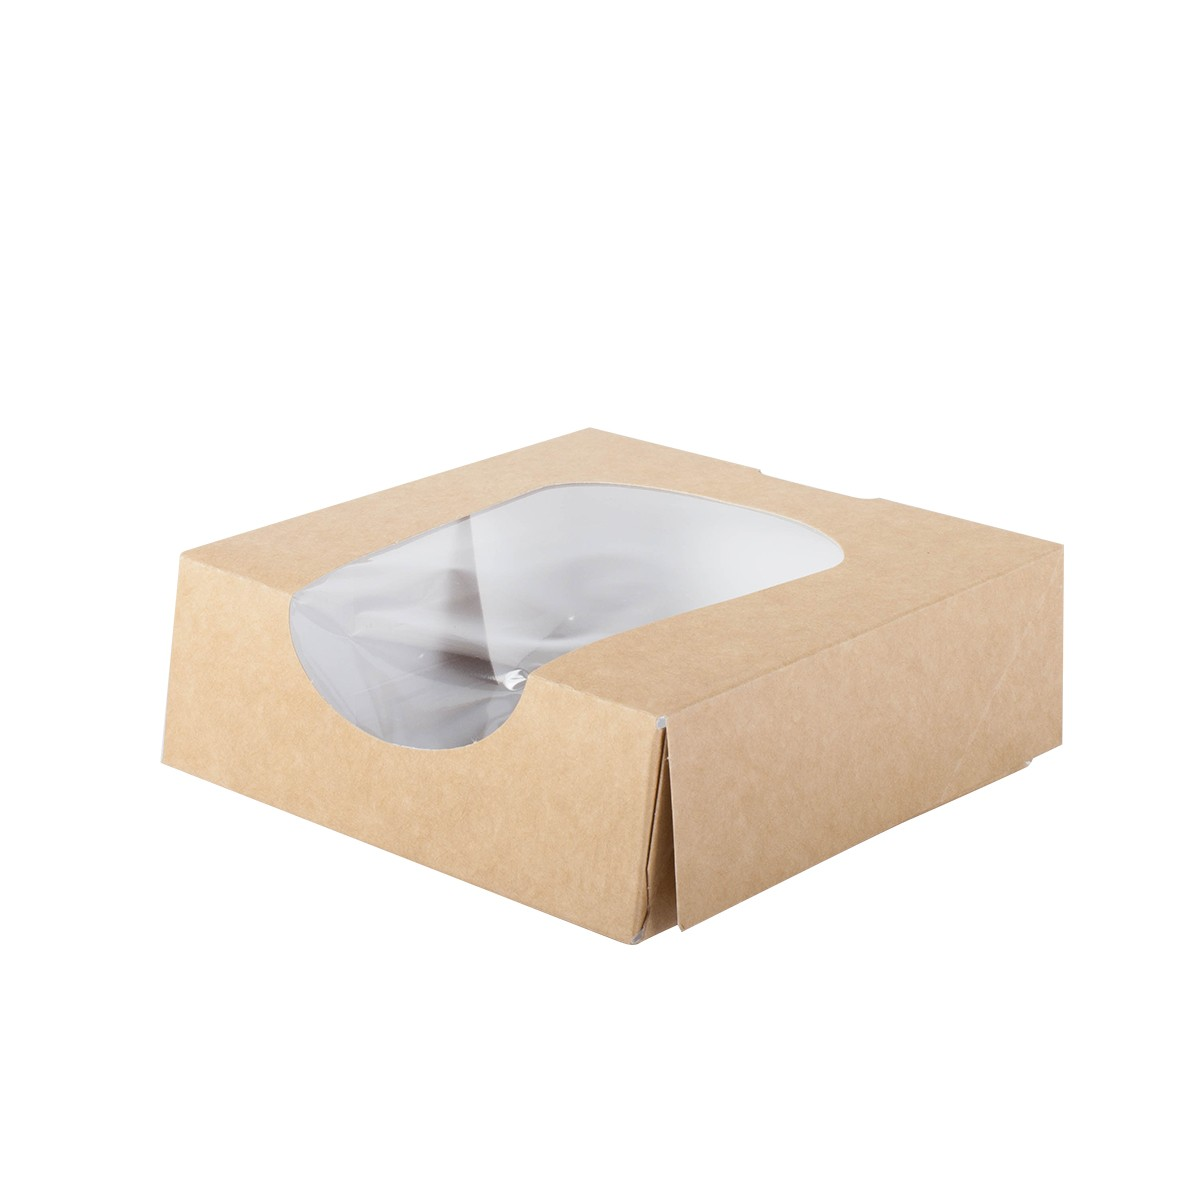 boite snacking carton avec fenetre vente à emporter